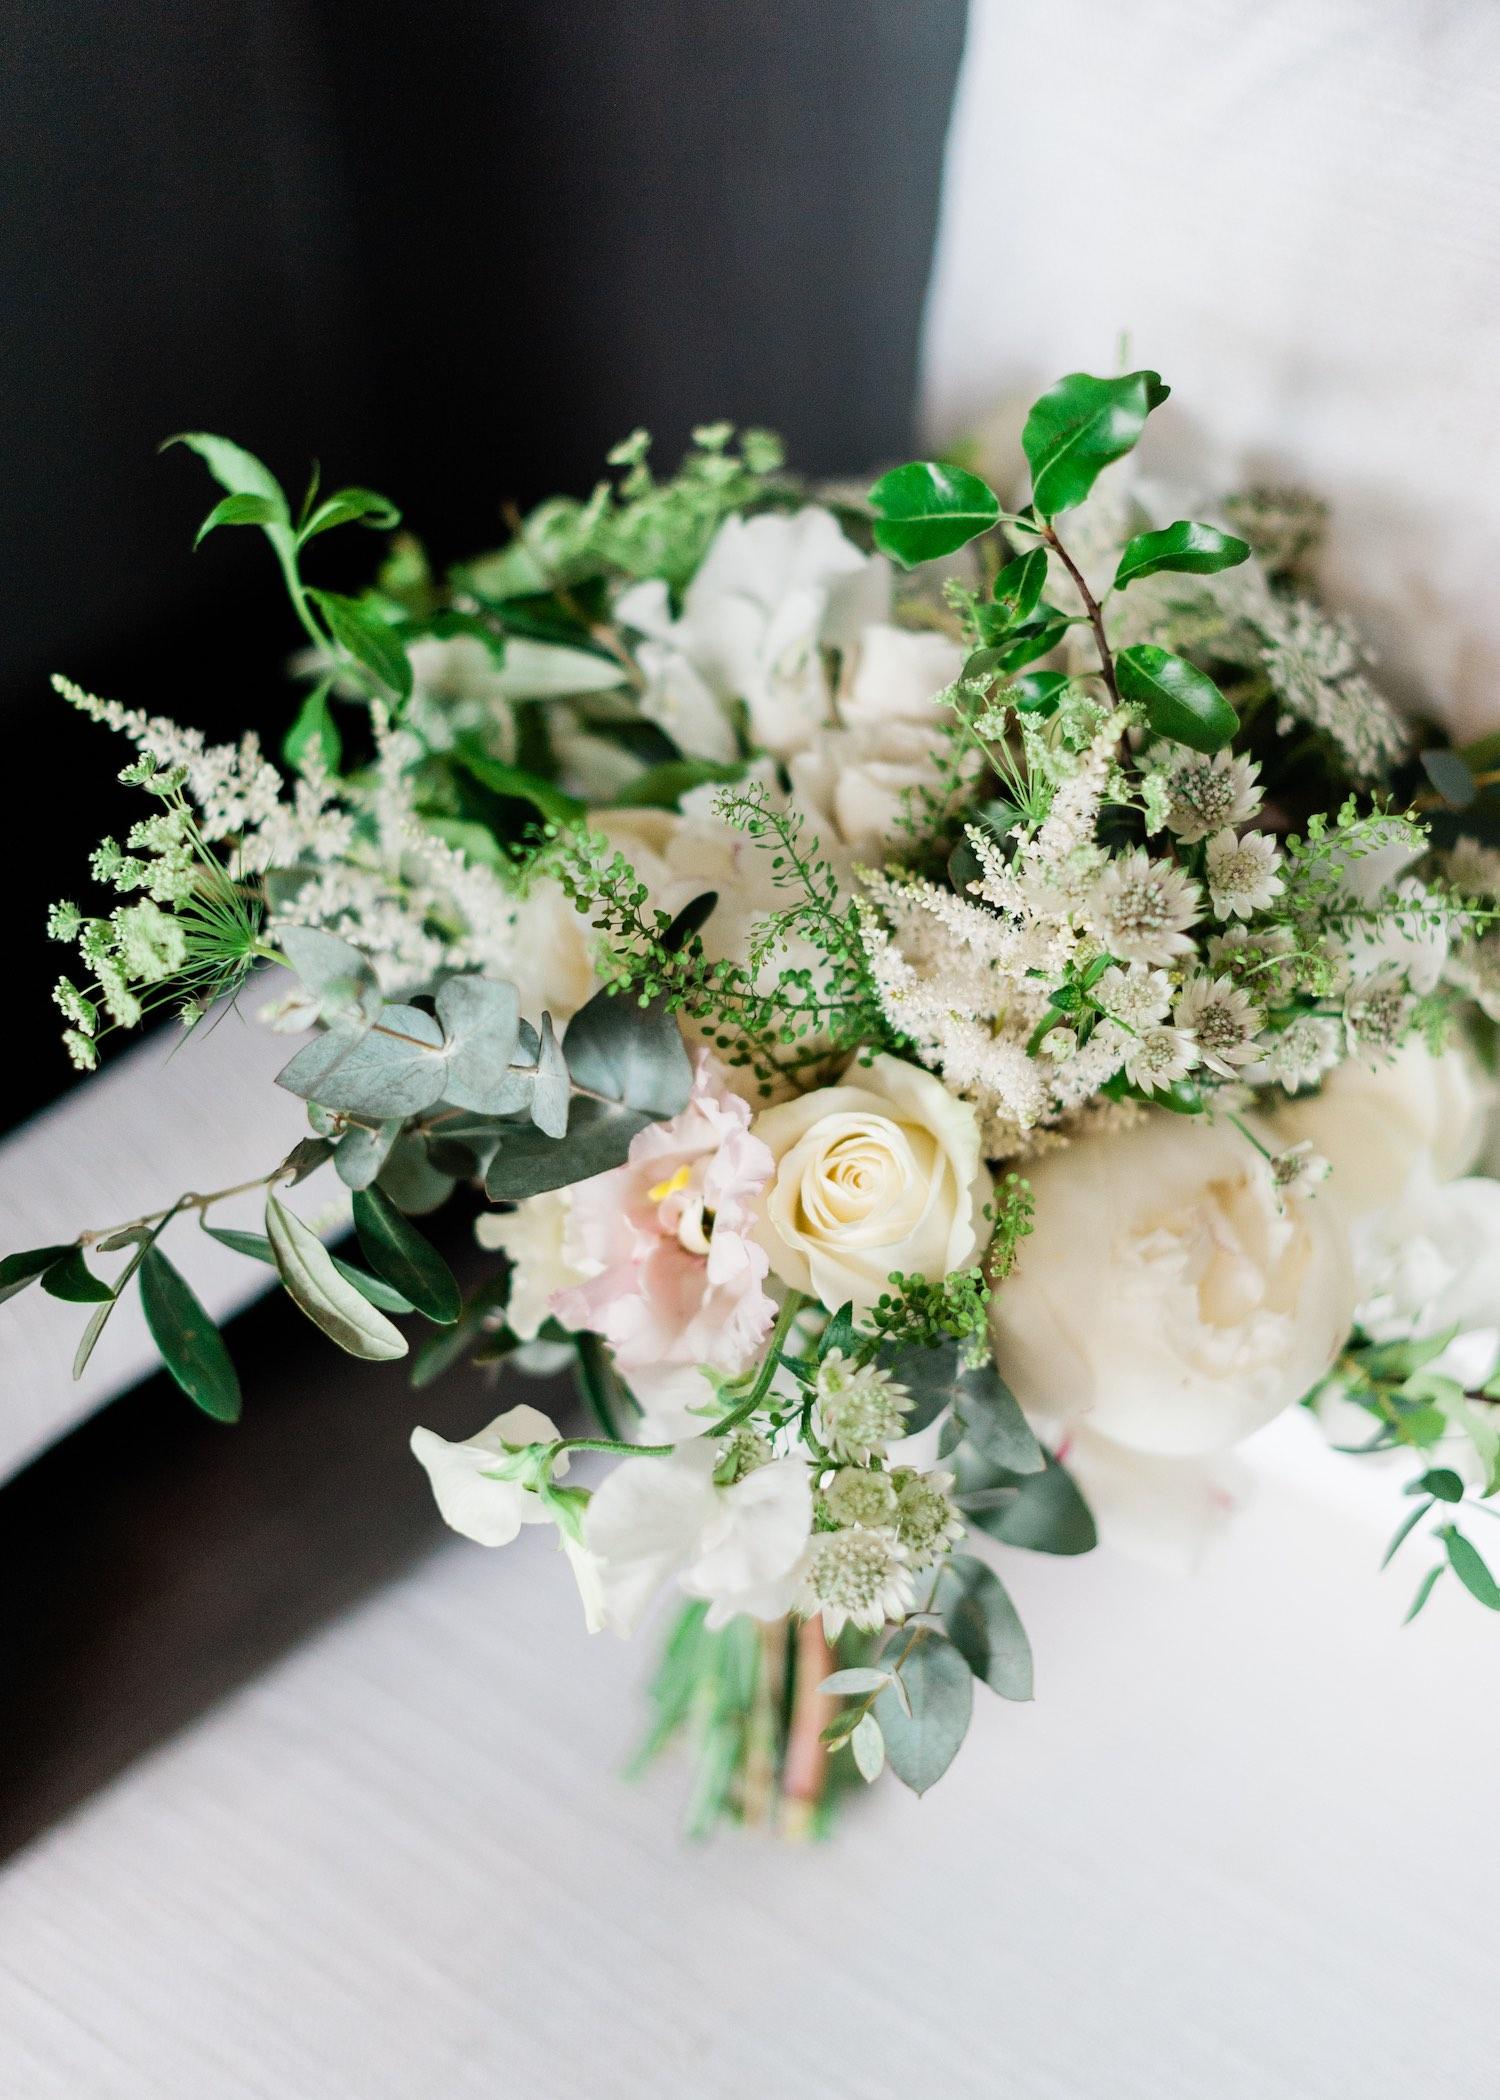 Littleton-Rose-Syon-House-London-Wedding-Planner-Bouquet.jpg